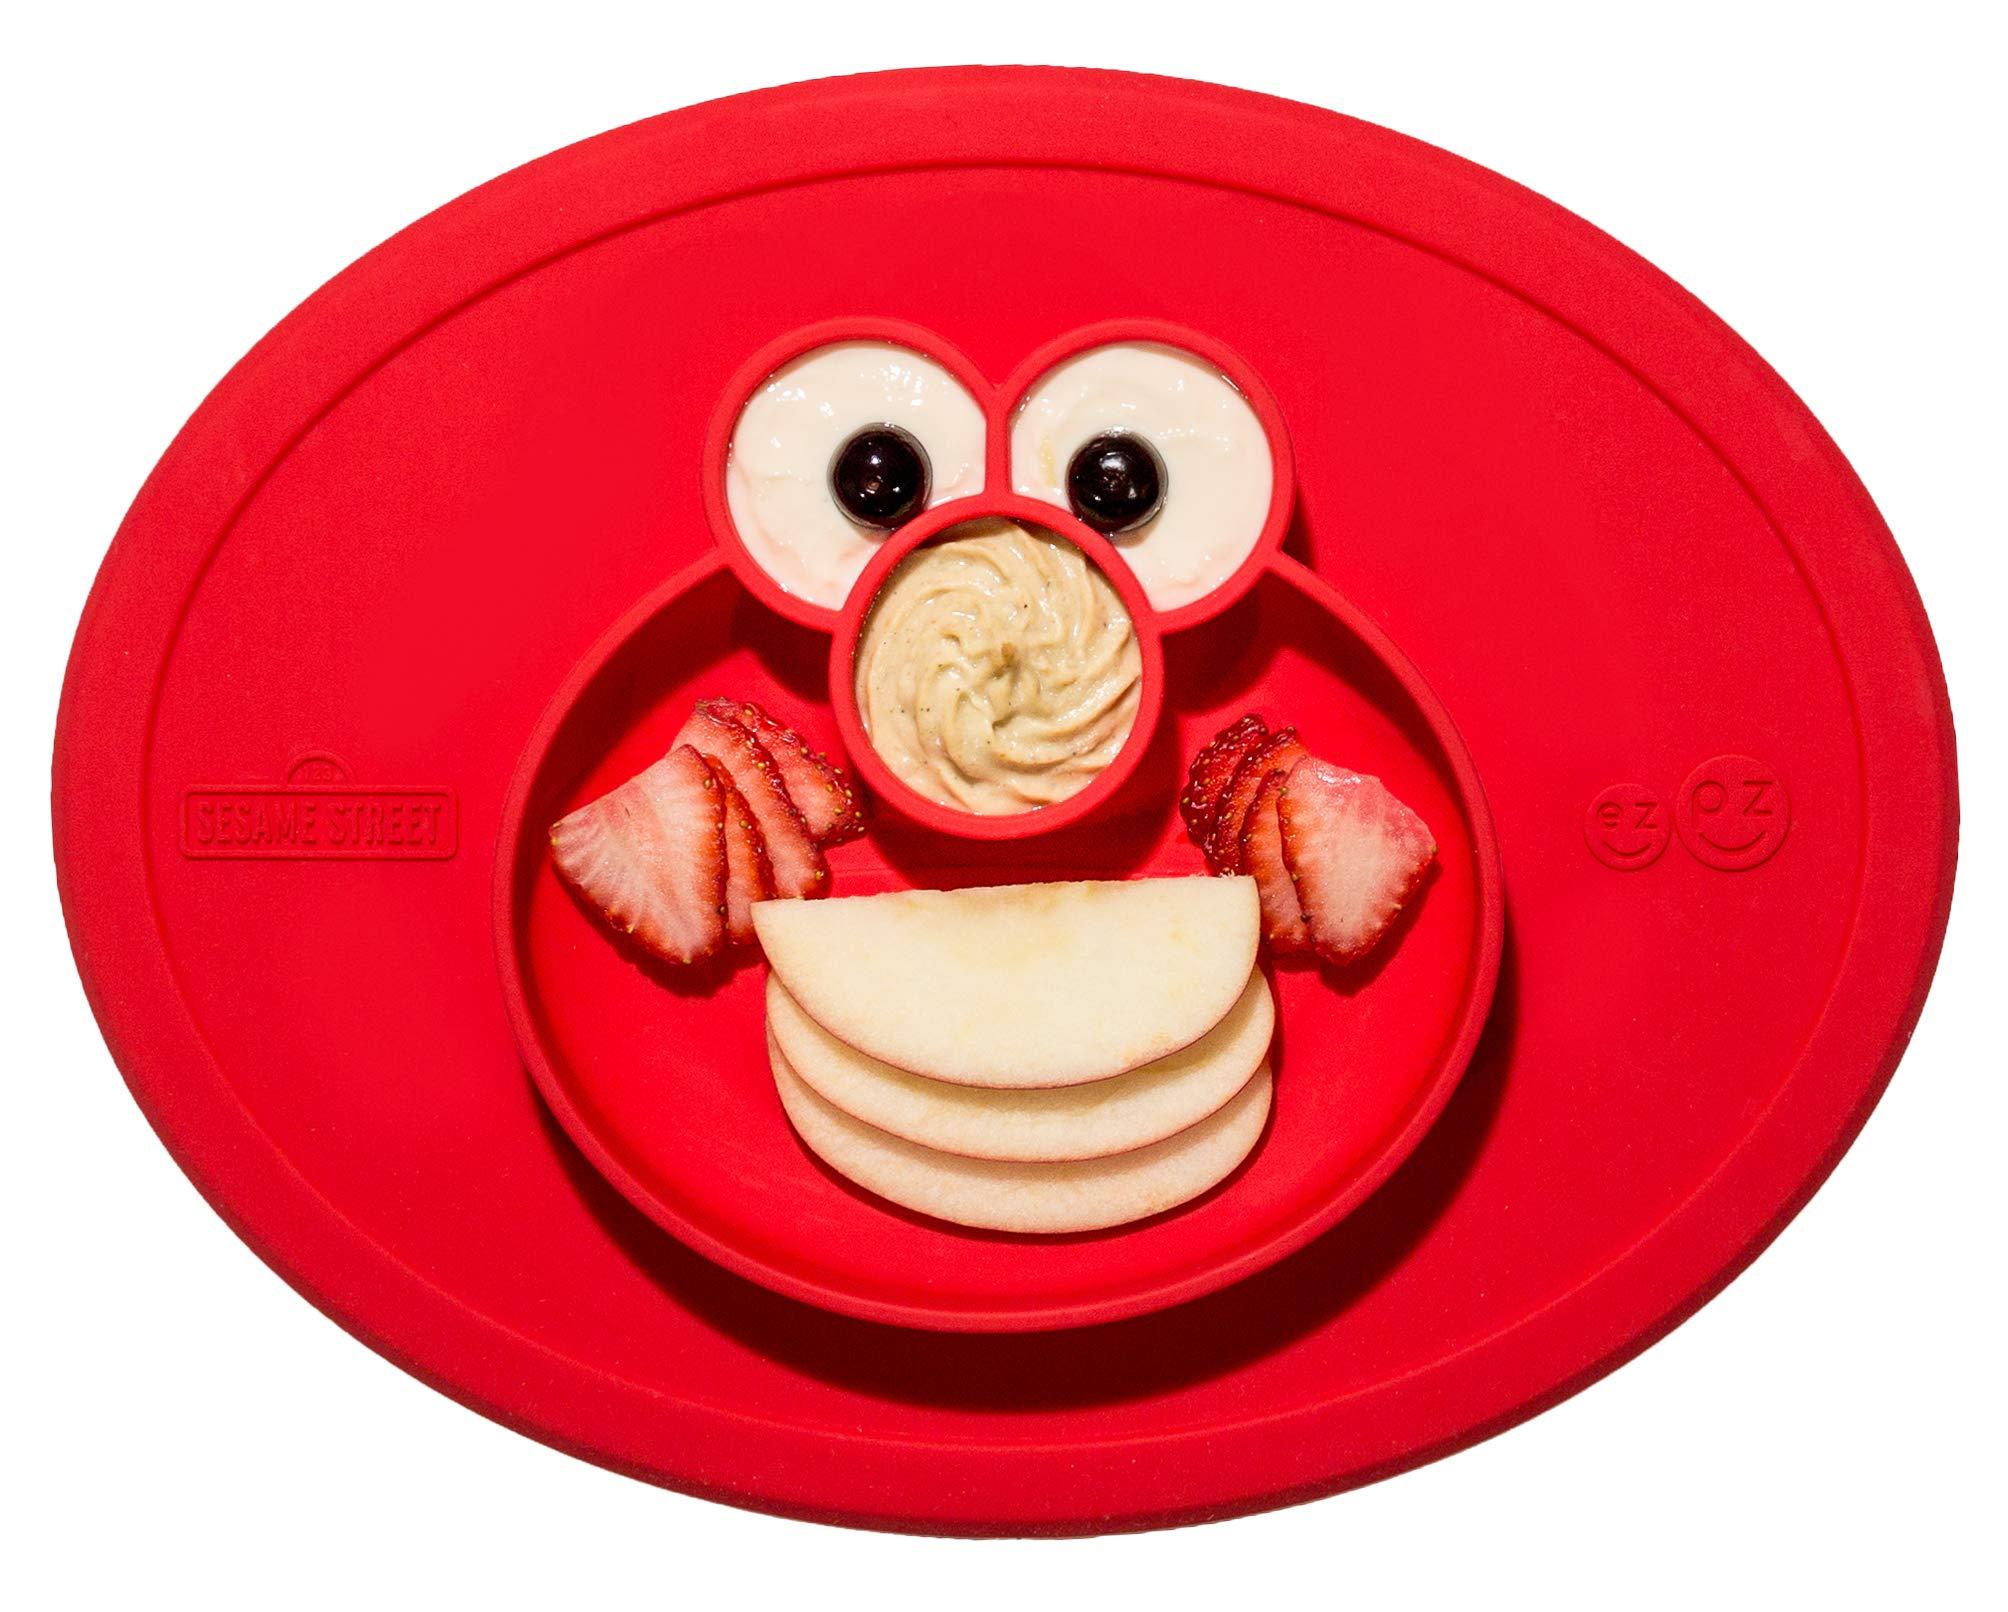 ezpz Sesame Street Elmo Mat - One-Piece Silicone placemat + Plate (Red) by ezpz